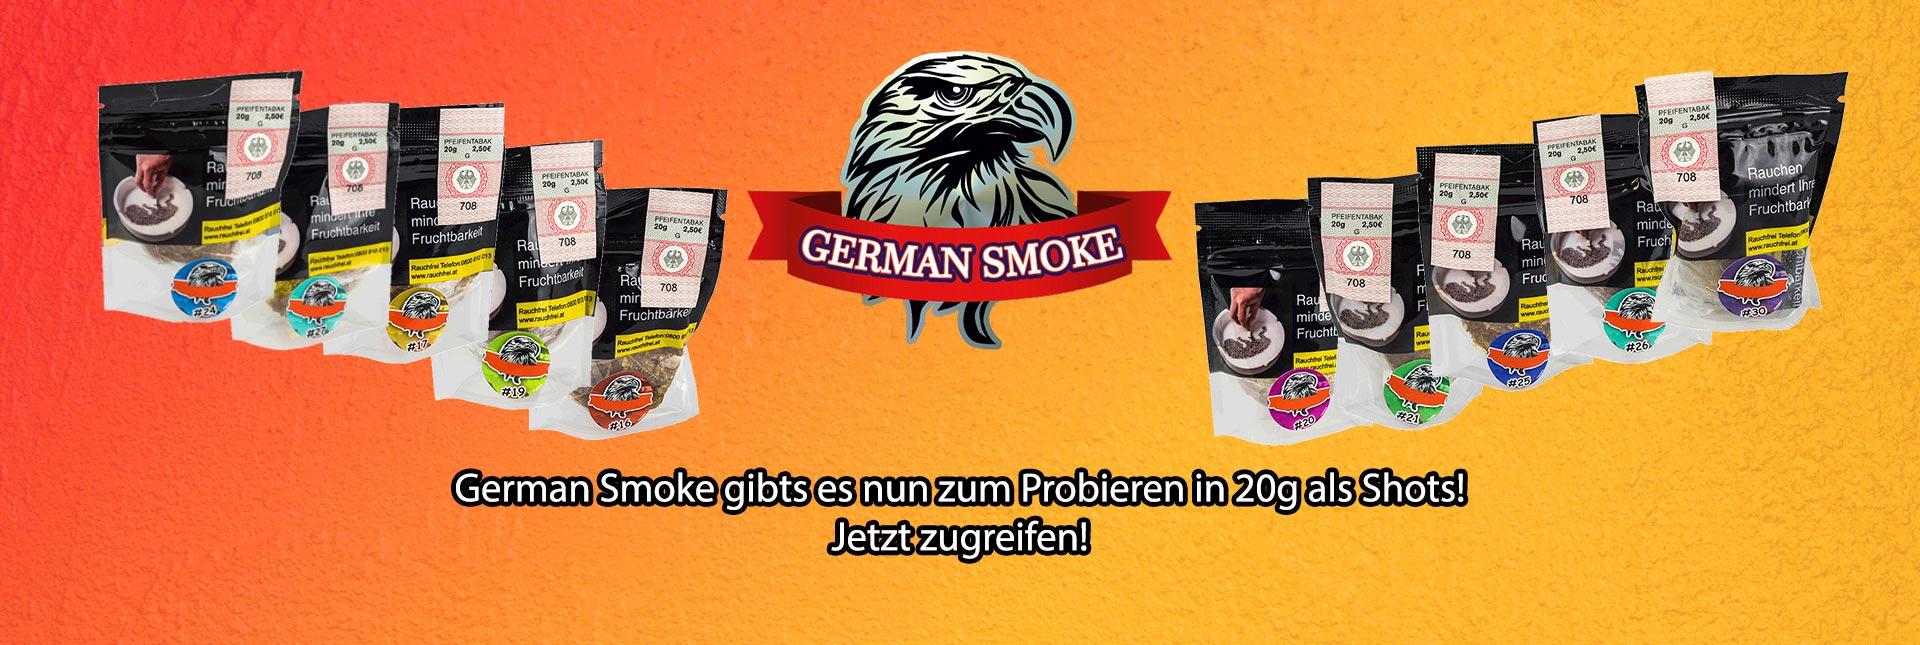 German Smoke - Gold Edition 20g